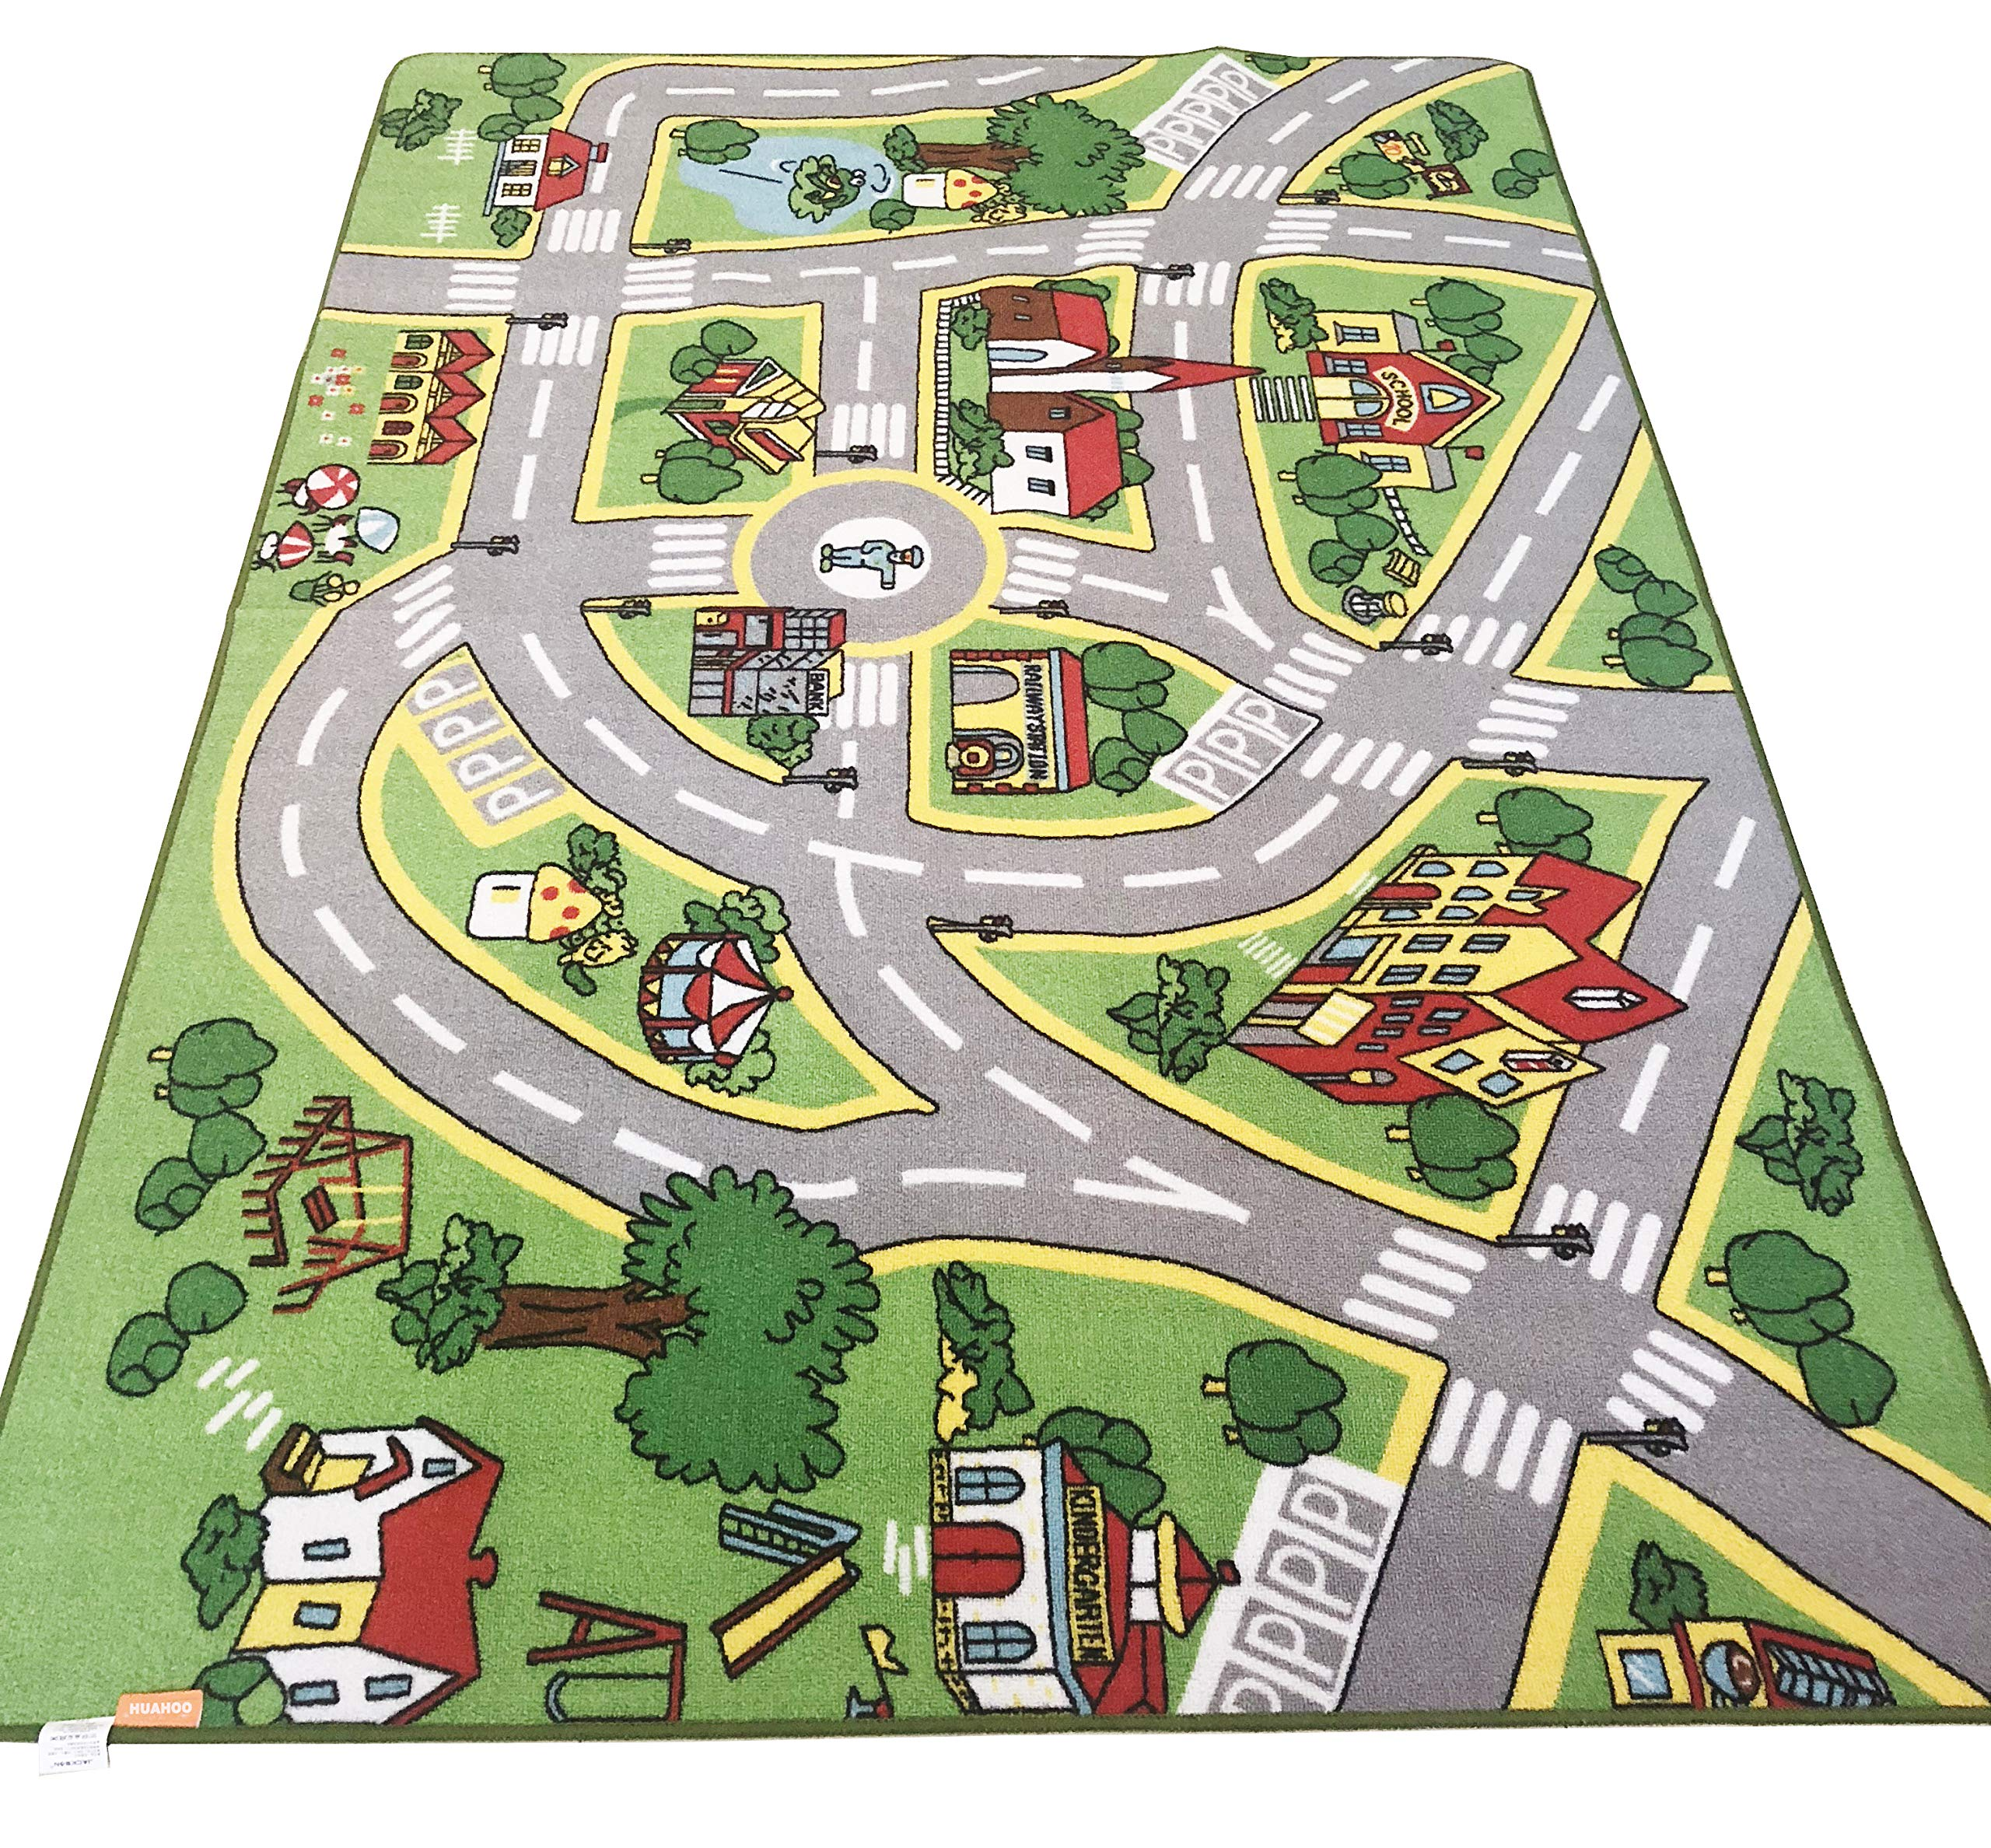 HUAHOO Kids' Rug with Roads Kids Rug Play mat City Street Map Children Learning Carpet Play Carpet Kids Rugs Boy Girl Nursery Bedroom Playroom Classrooms Play Mat Children's Area Rug (52'' x 75'')